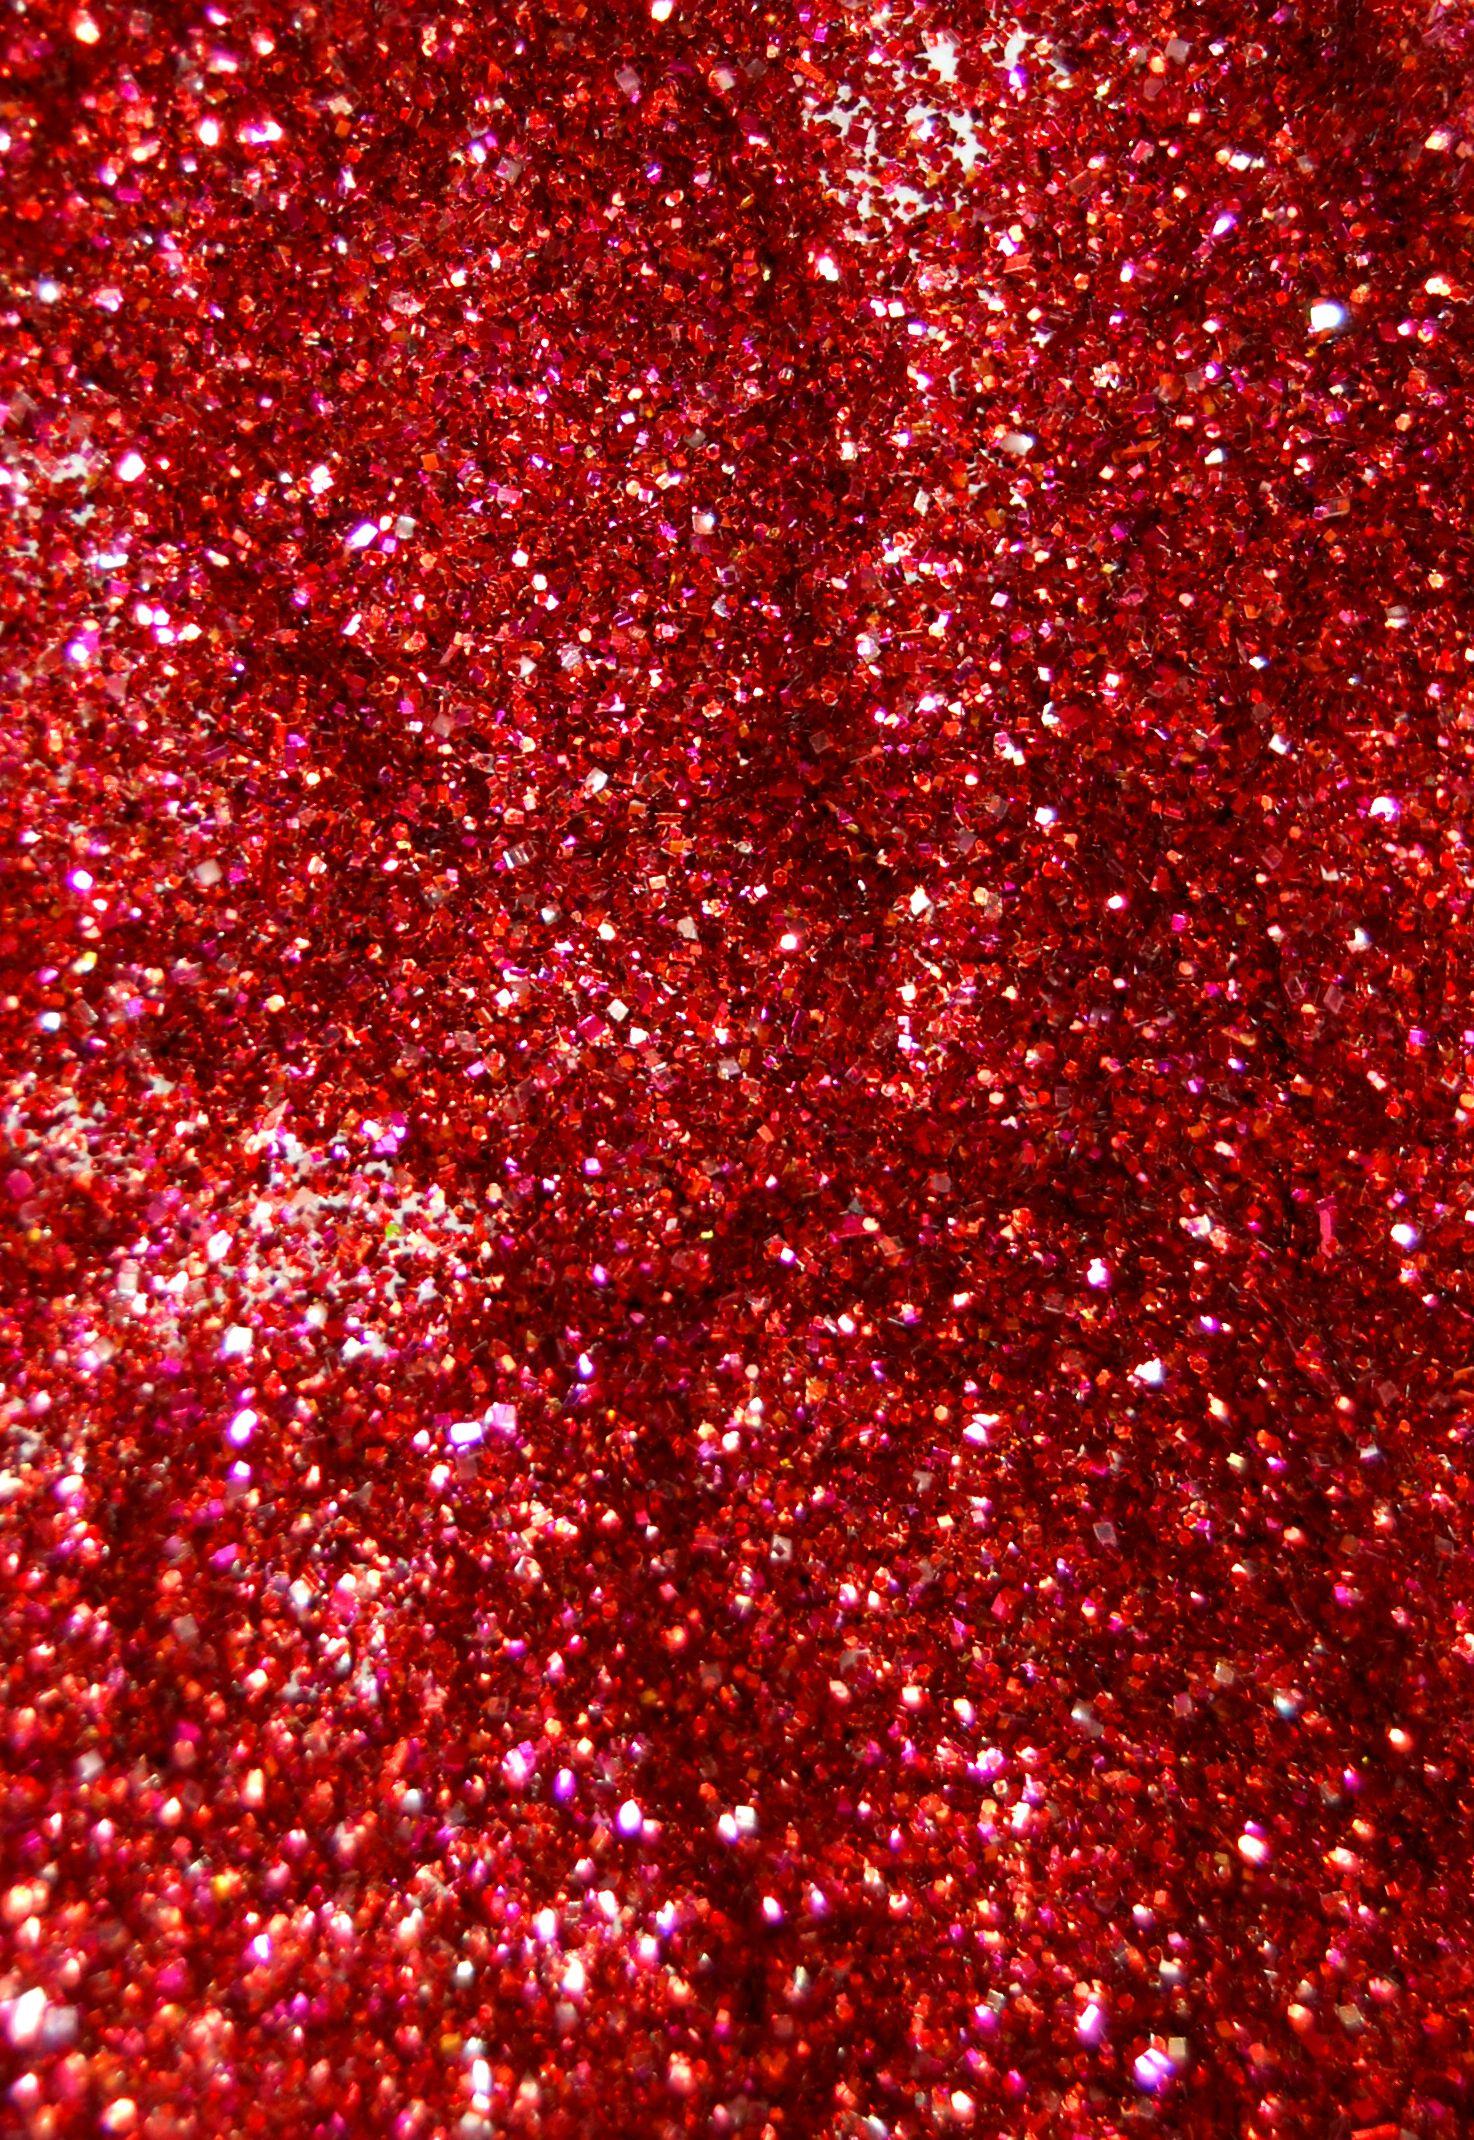 Pix For Dark Red Glitter Background Red Glitter Background Red Glitter Wallpaper Red Glitter